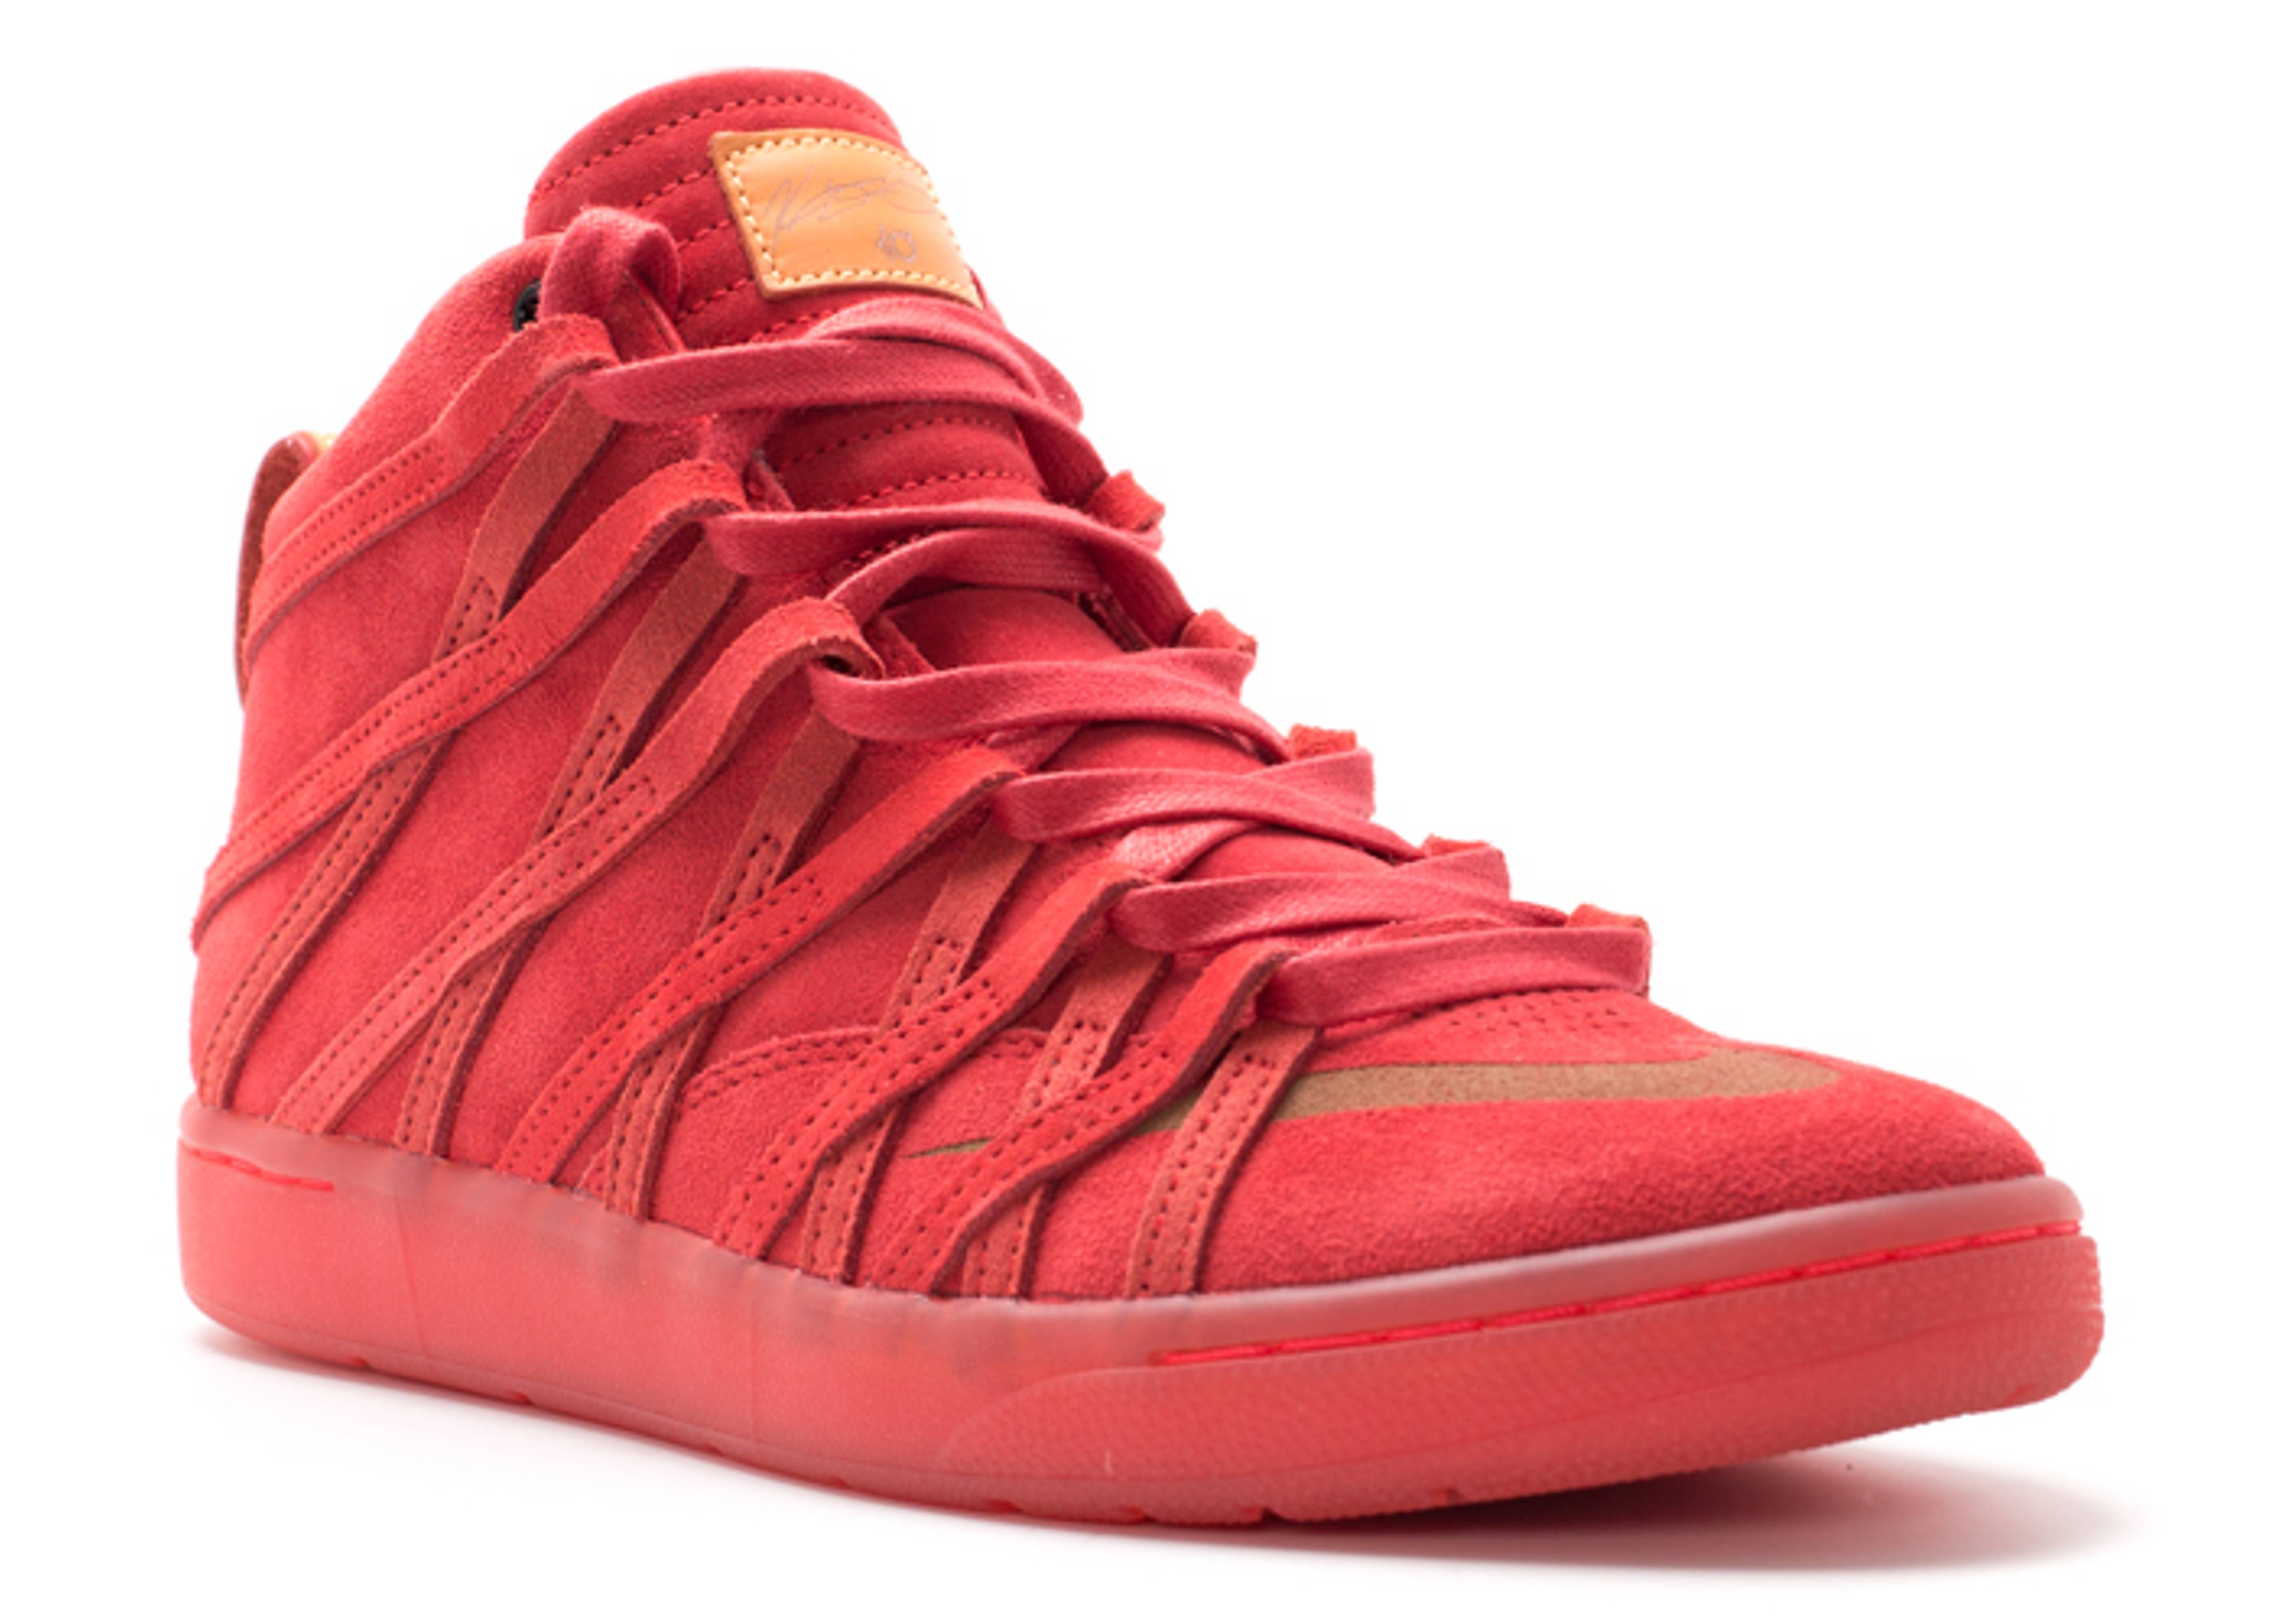 ... kd 7 nsw lifestyle qs chllng rdchllng rd-pch crm-bl 621945-001 Nike ...